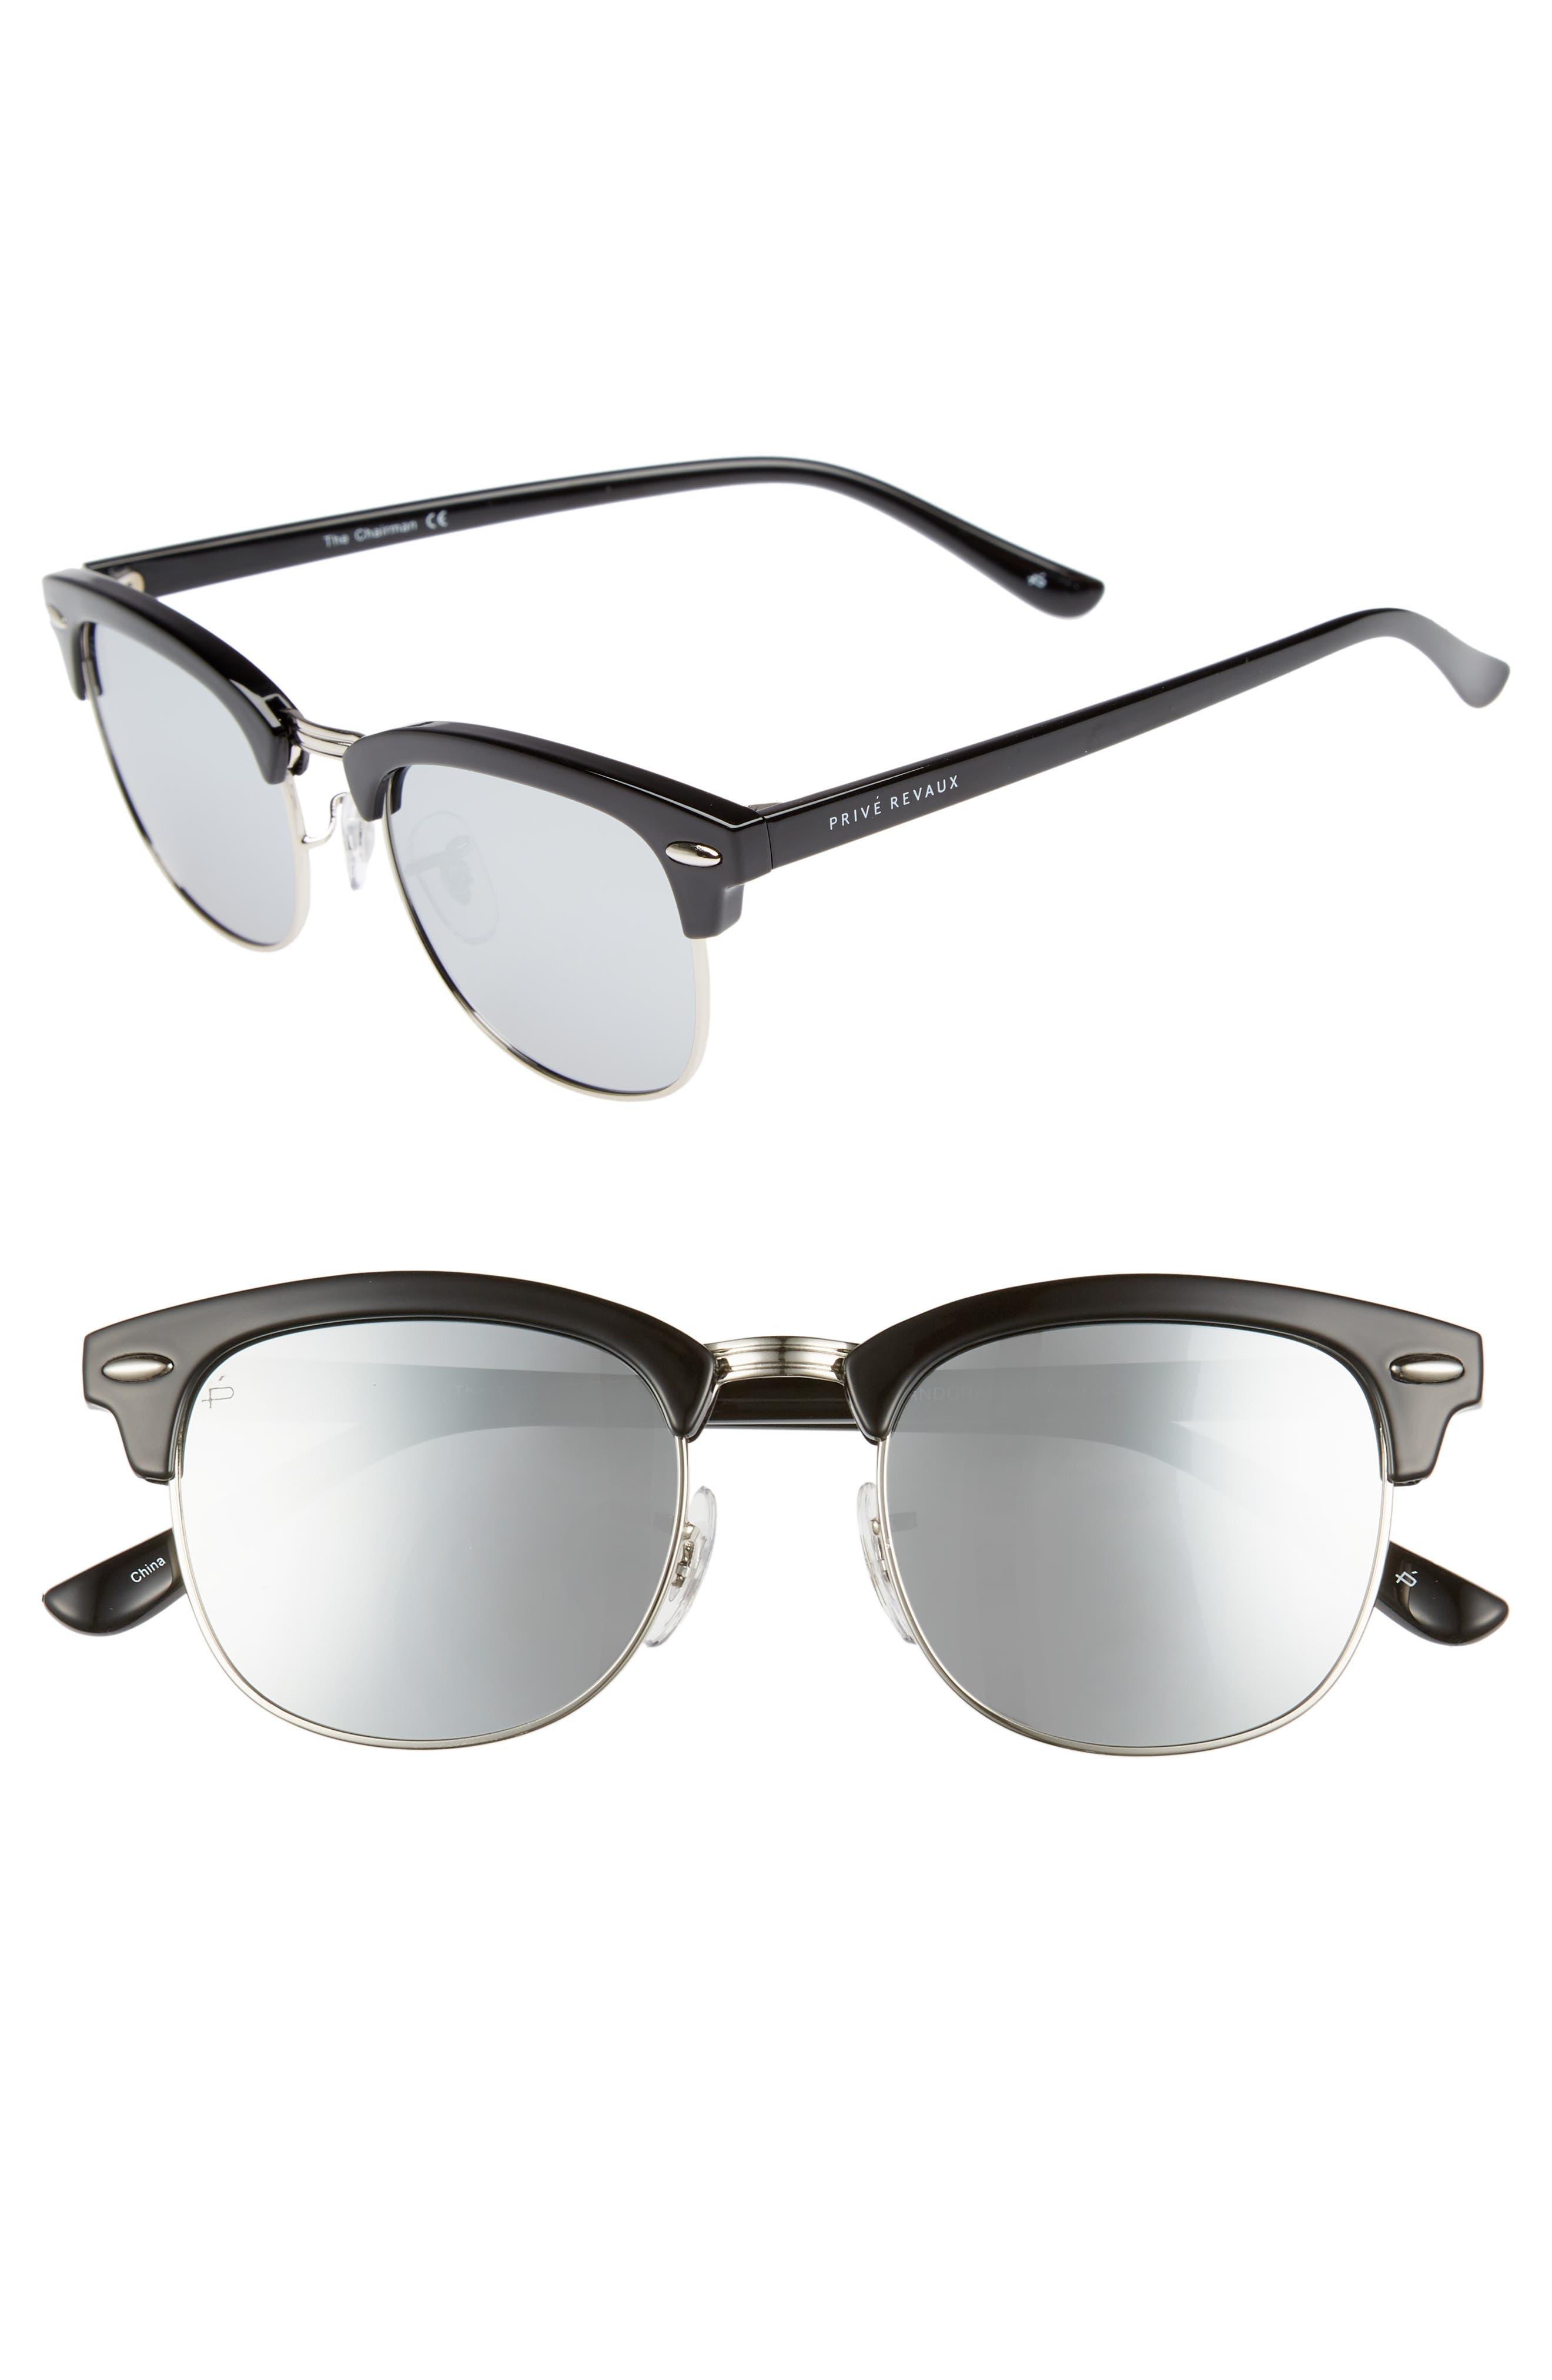 Privé Revaux The Chairman 52mm Polarized Browline Sunglasses,                             Main thumbnail 1, color,